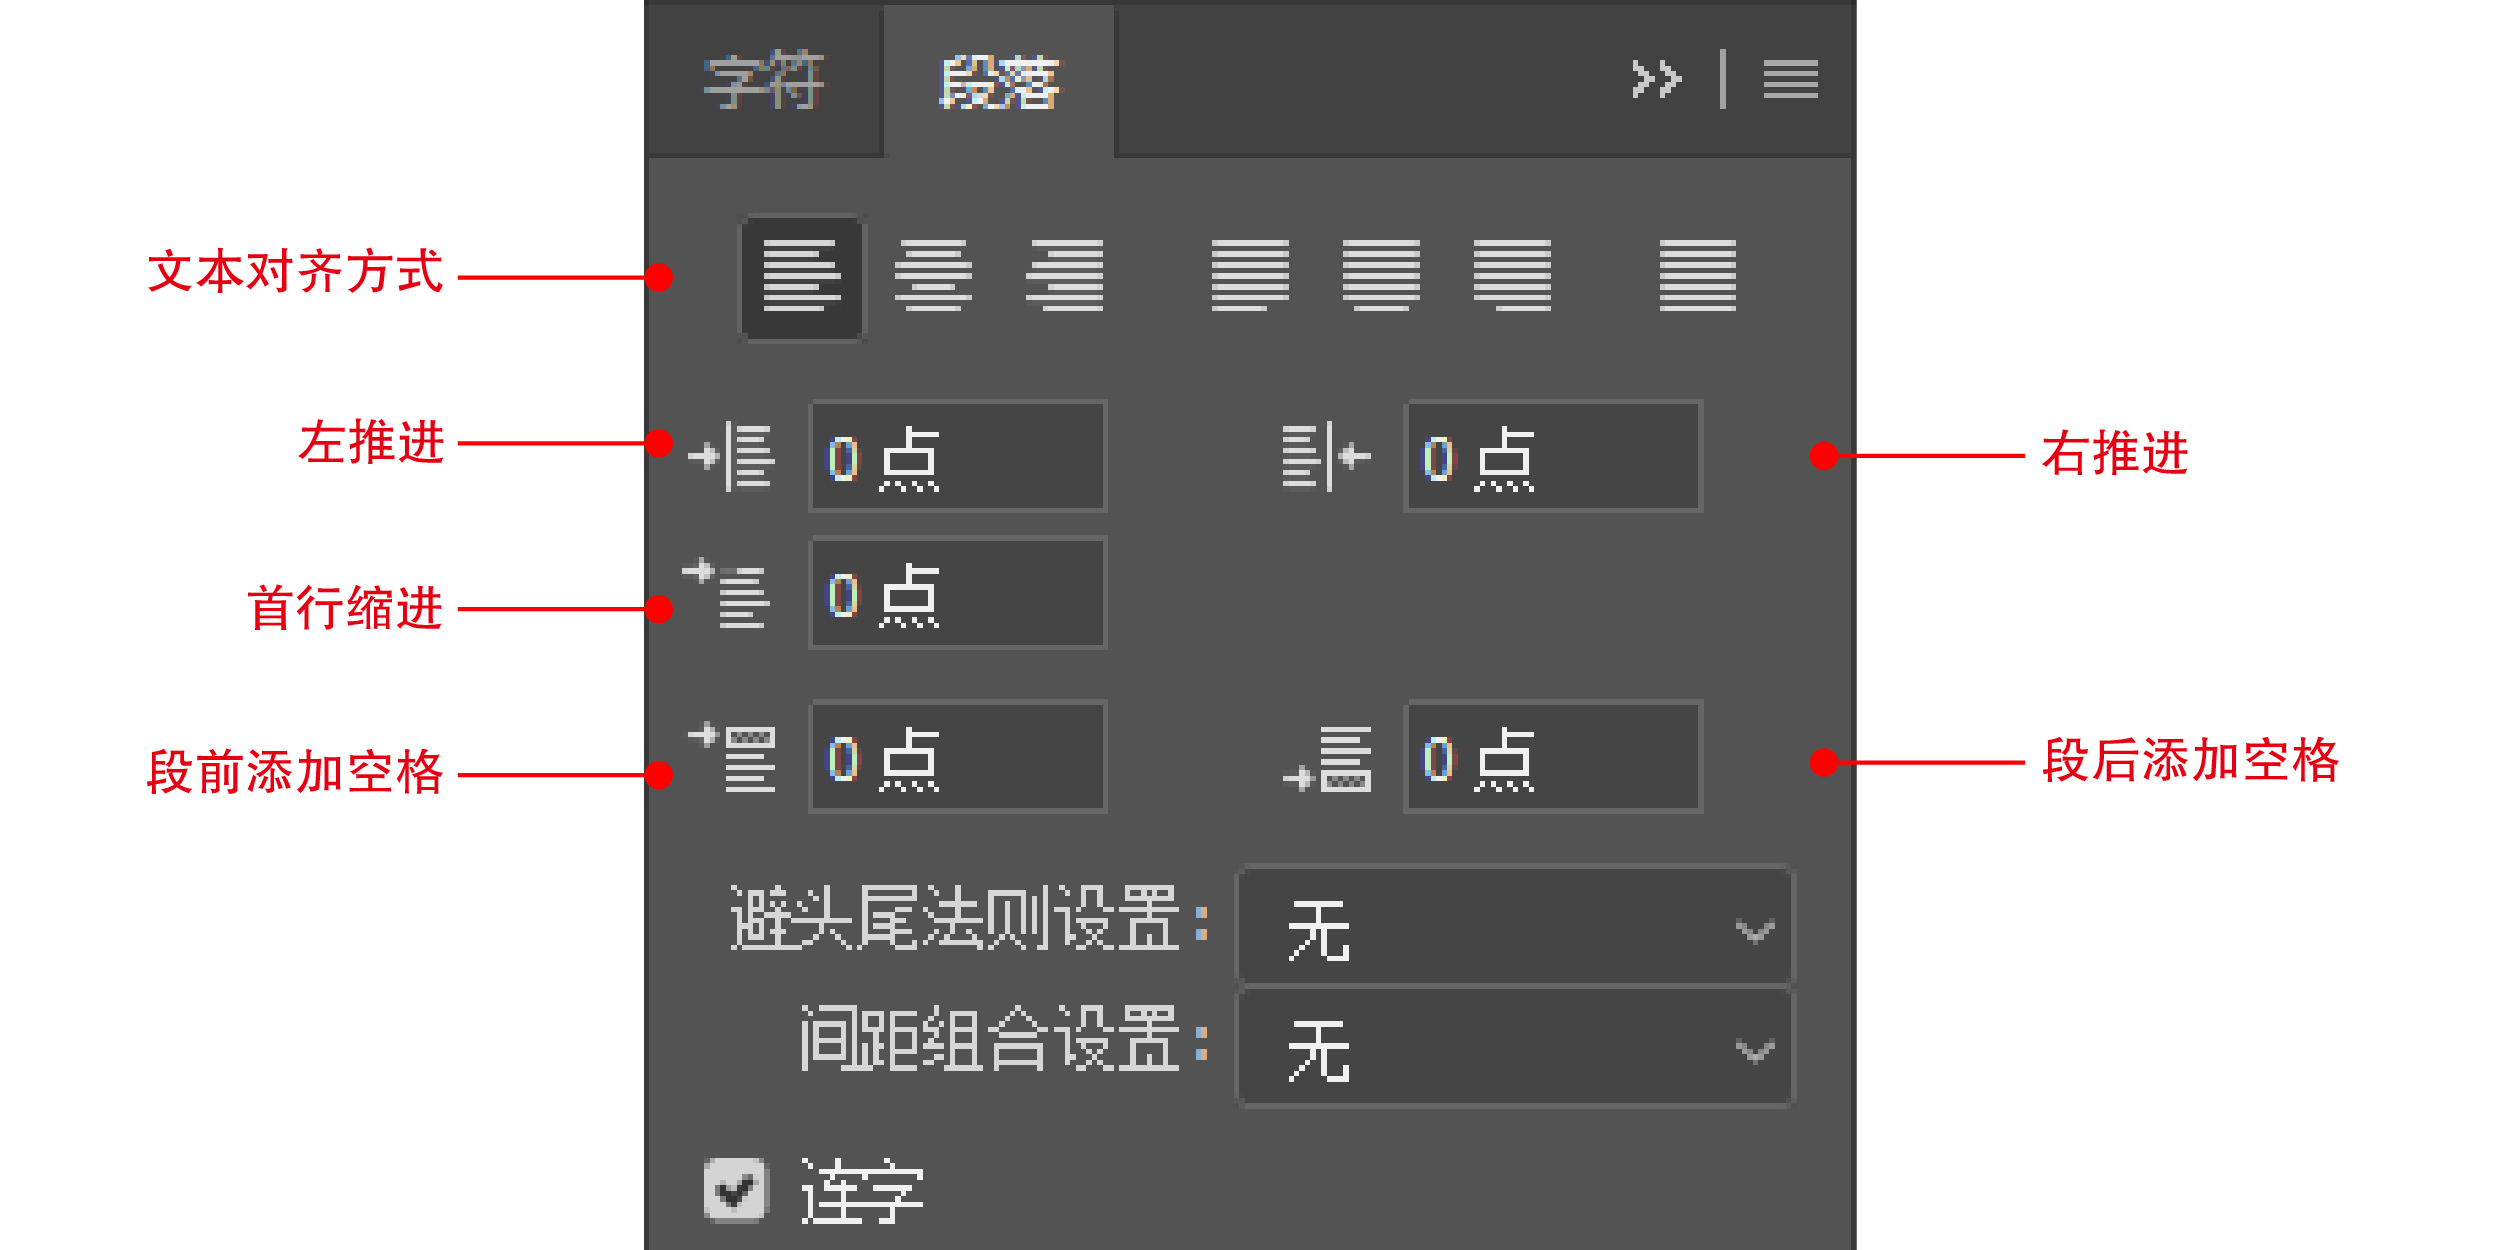 PS字符和段落应用区别有哪些?